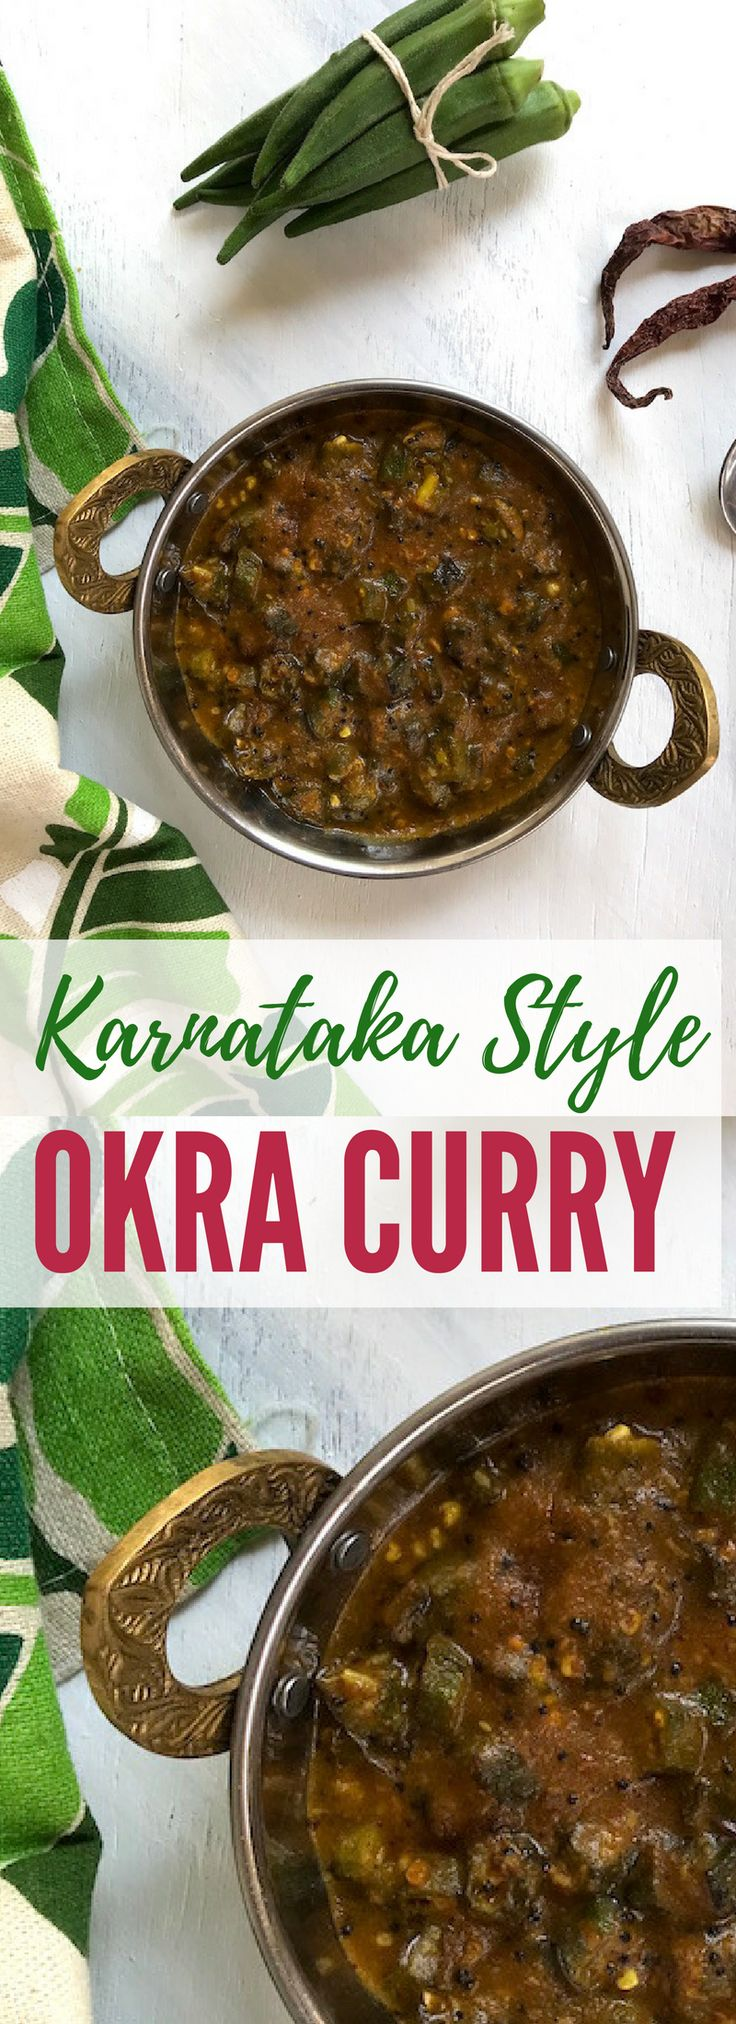 Recipe for Bendekai Gojju, a South Indian style Okra Curry made using seasonal fresh okra, in a tamarind base